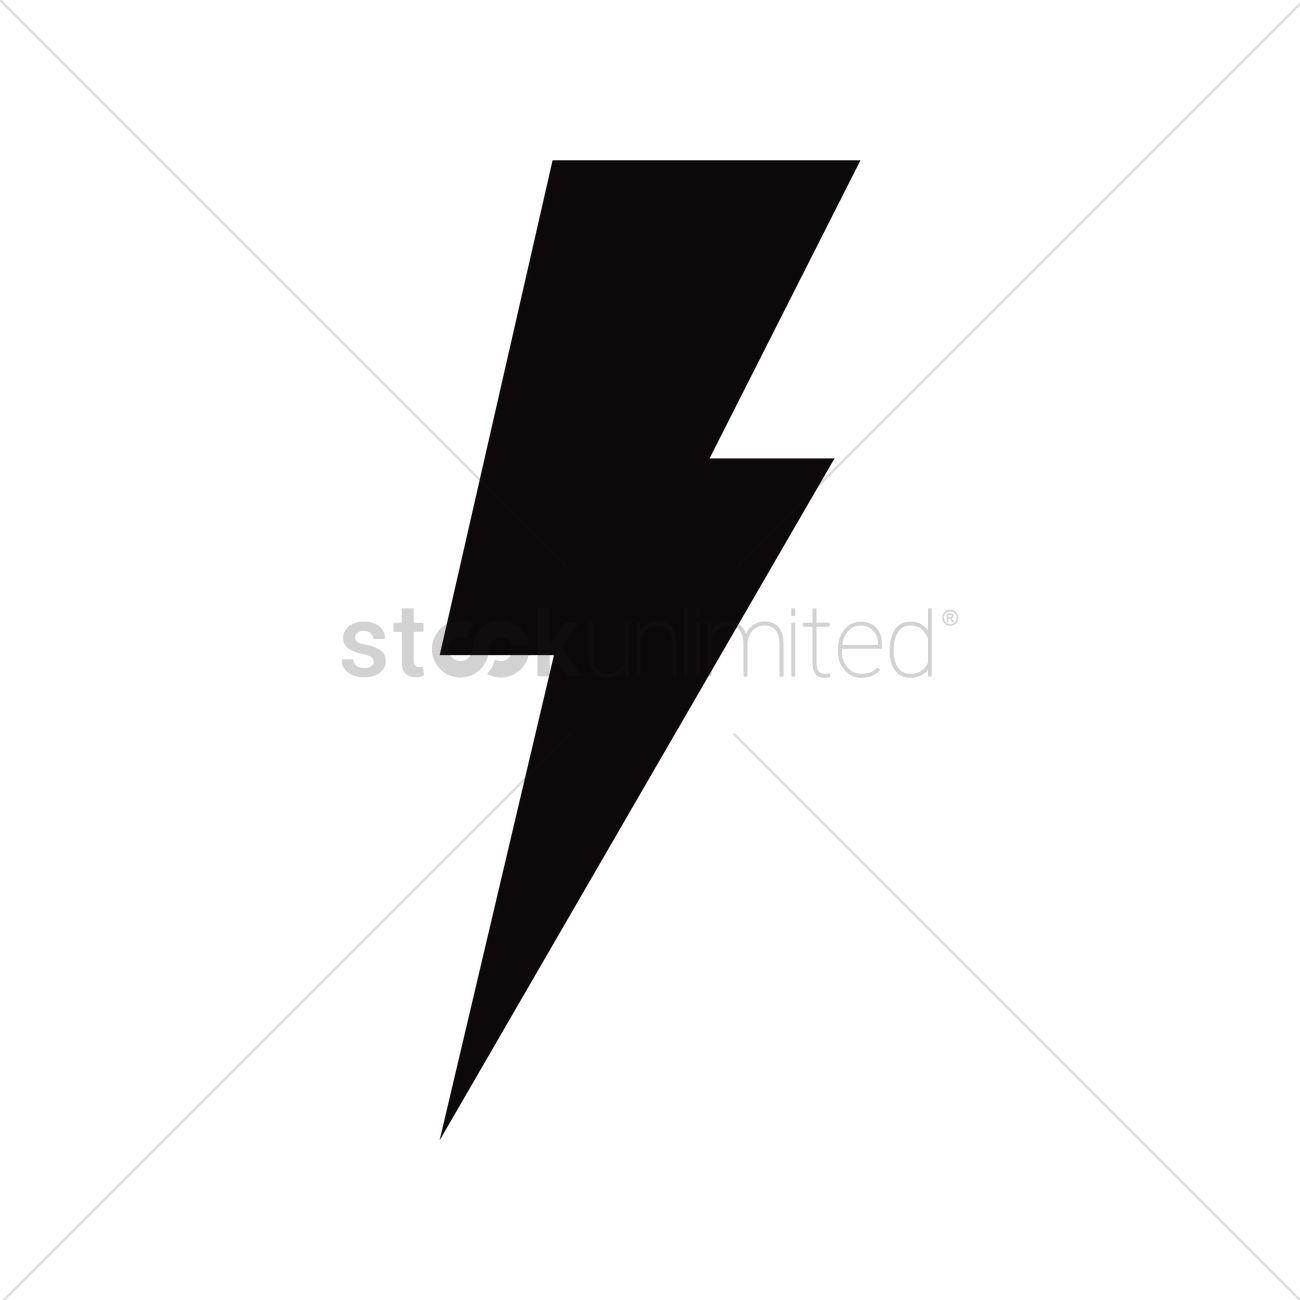 lightning vector image 1550521 stockunlimited rh stockunlimited com lightning vector psd lightning vector icon